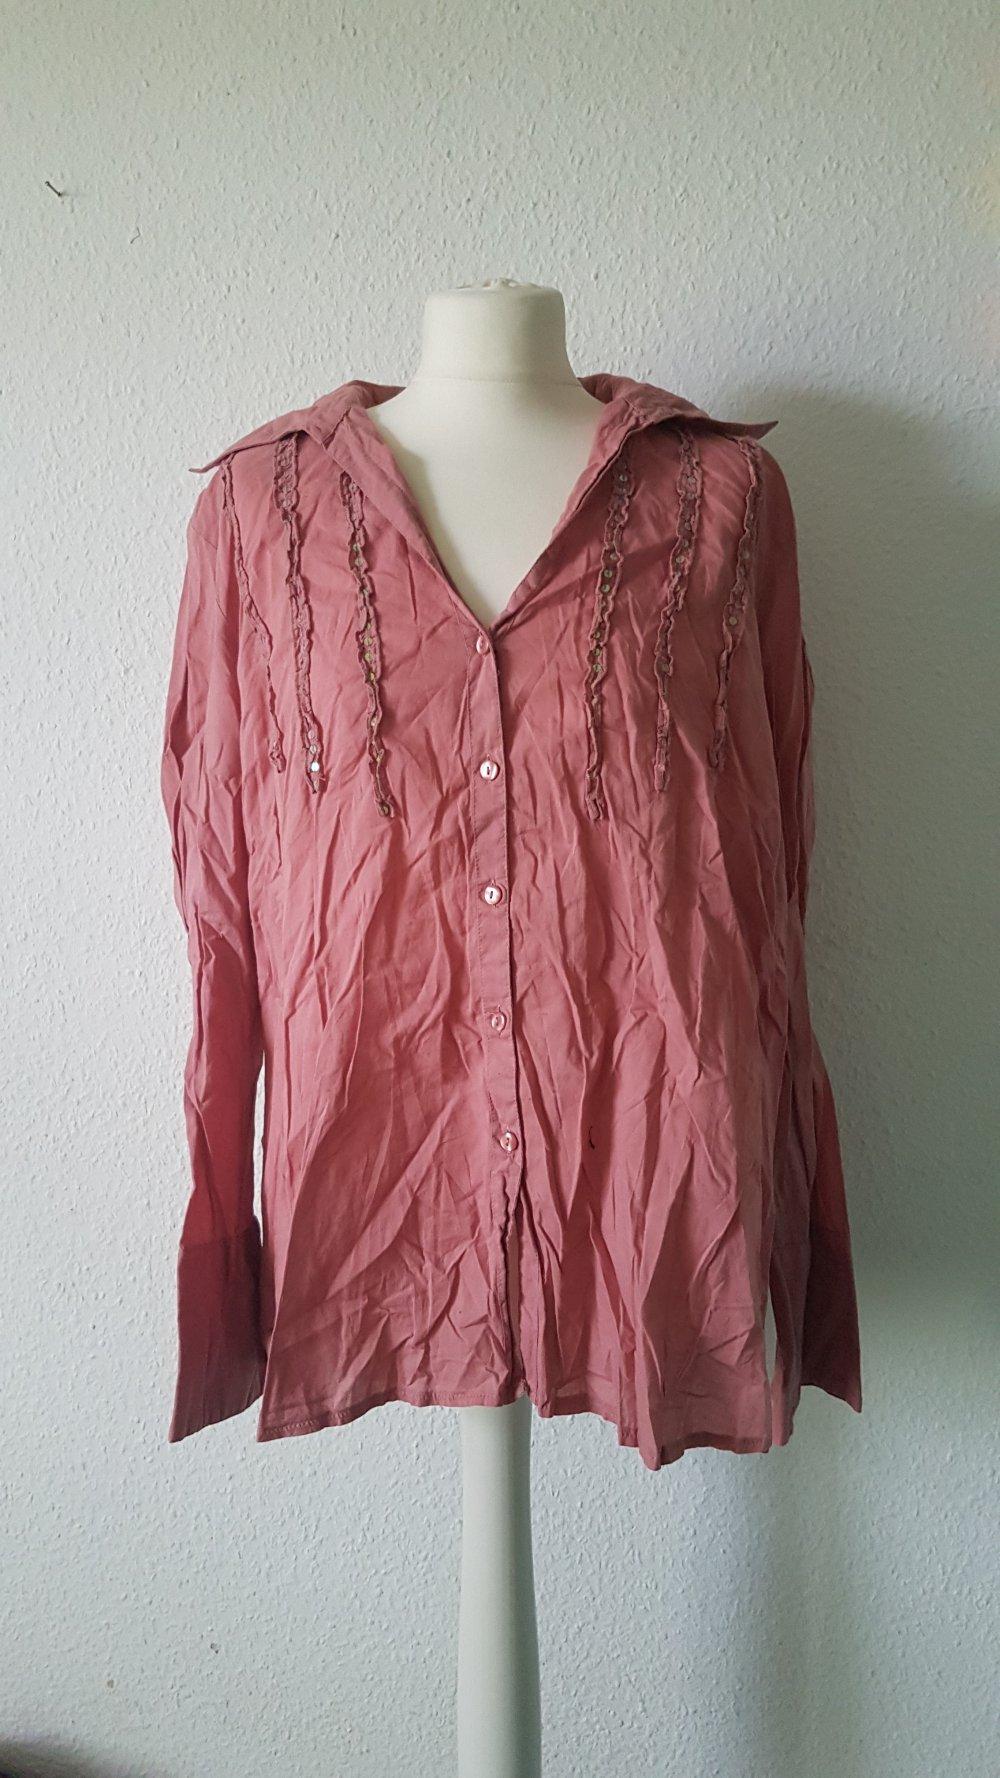 46 Damen Tunika Bluse Blusenshirt Cremeweiß Bunt Gr